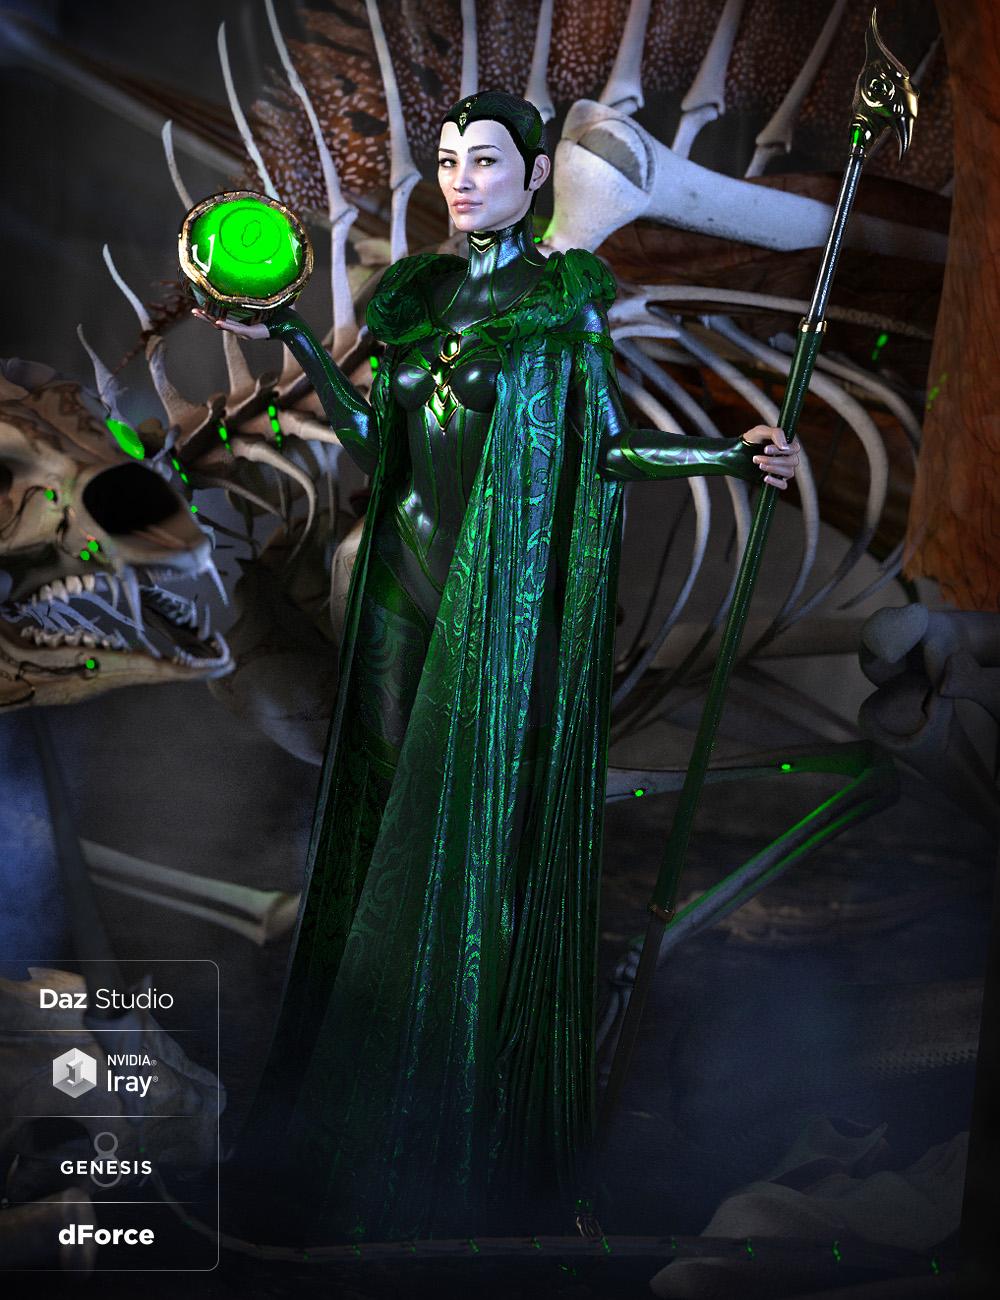 dForce Bone Conjurer Outfit for Genesis 8 Female(s) by: Arki, 3D Models by Daz 3D